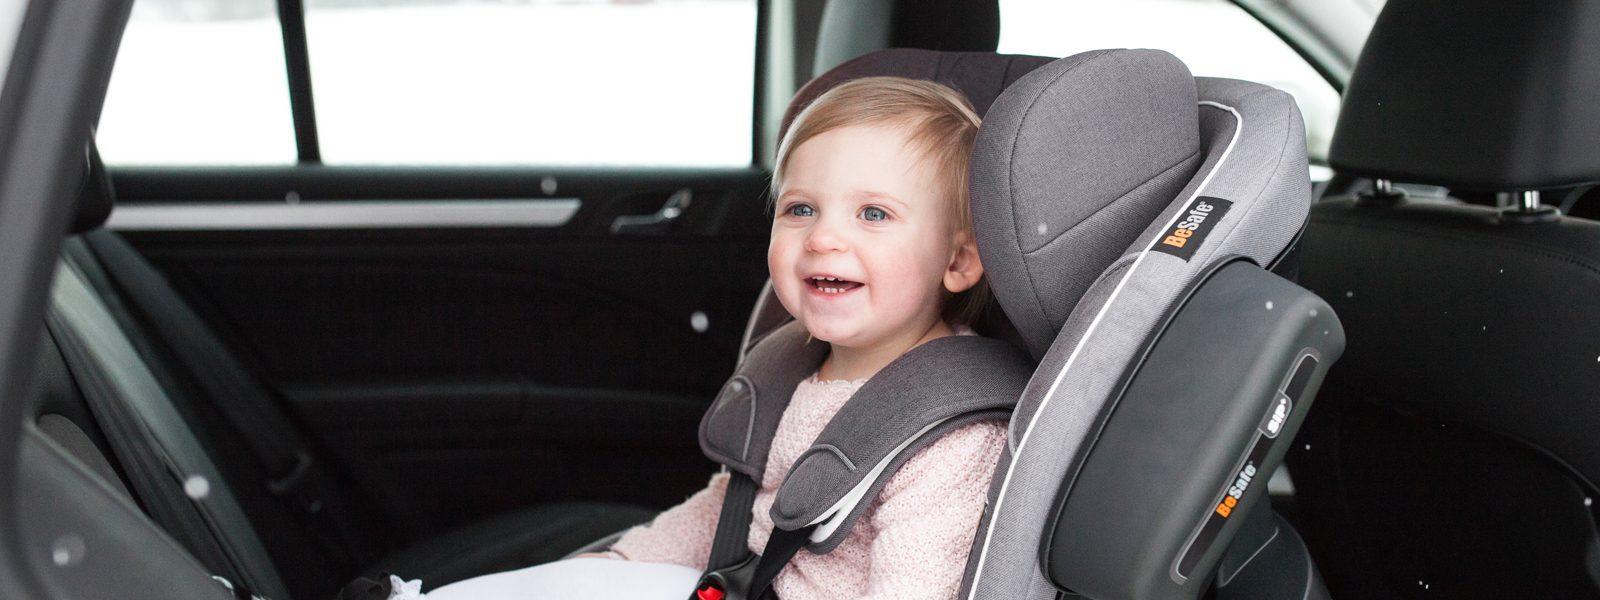 winter jackets car seats correct